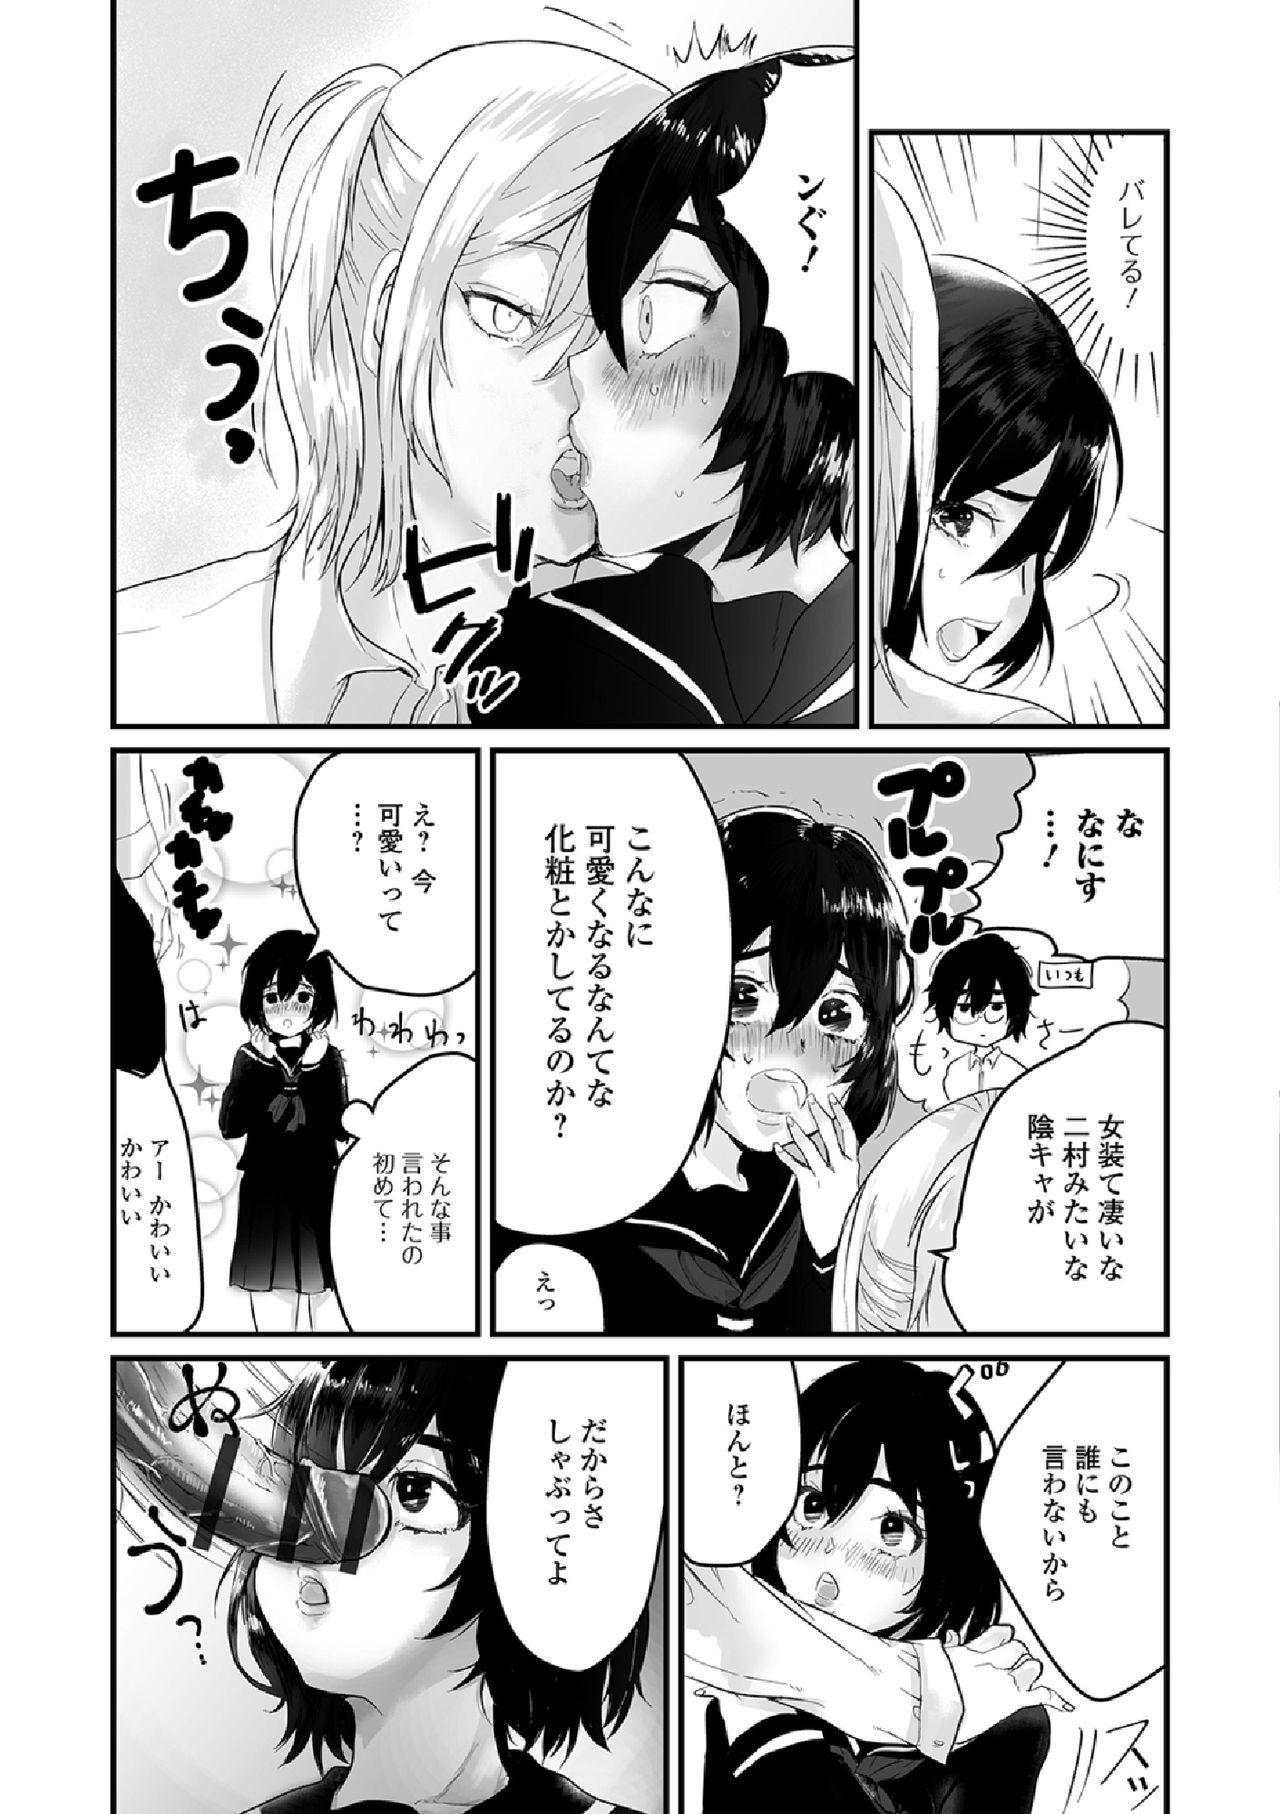 Gekkan Web Otoko no Ko-llection! S Vol. 38 40